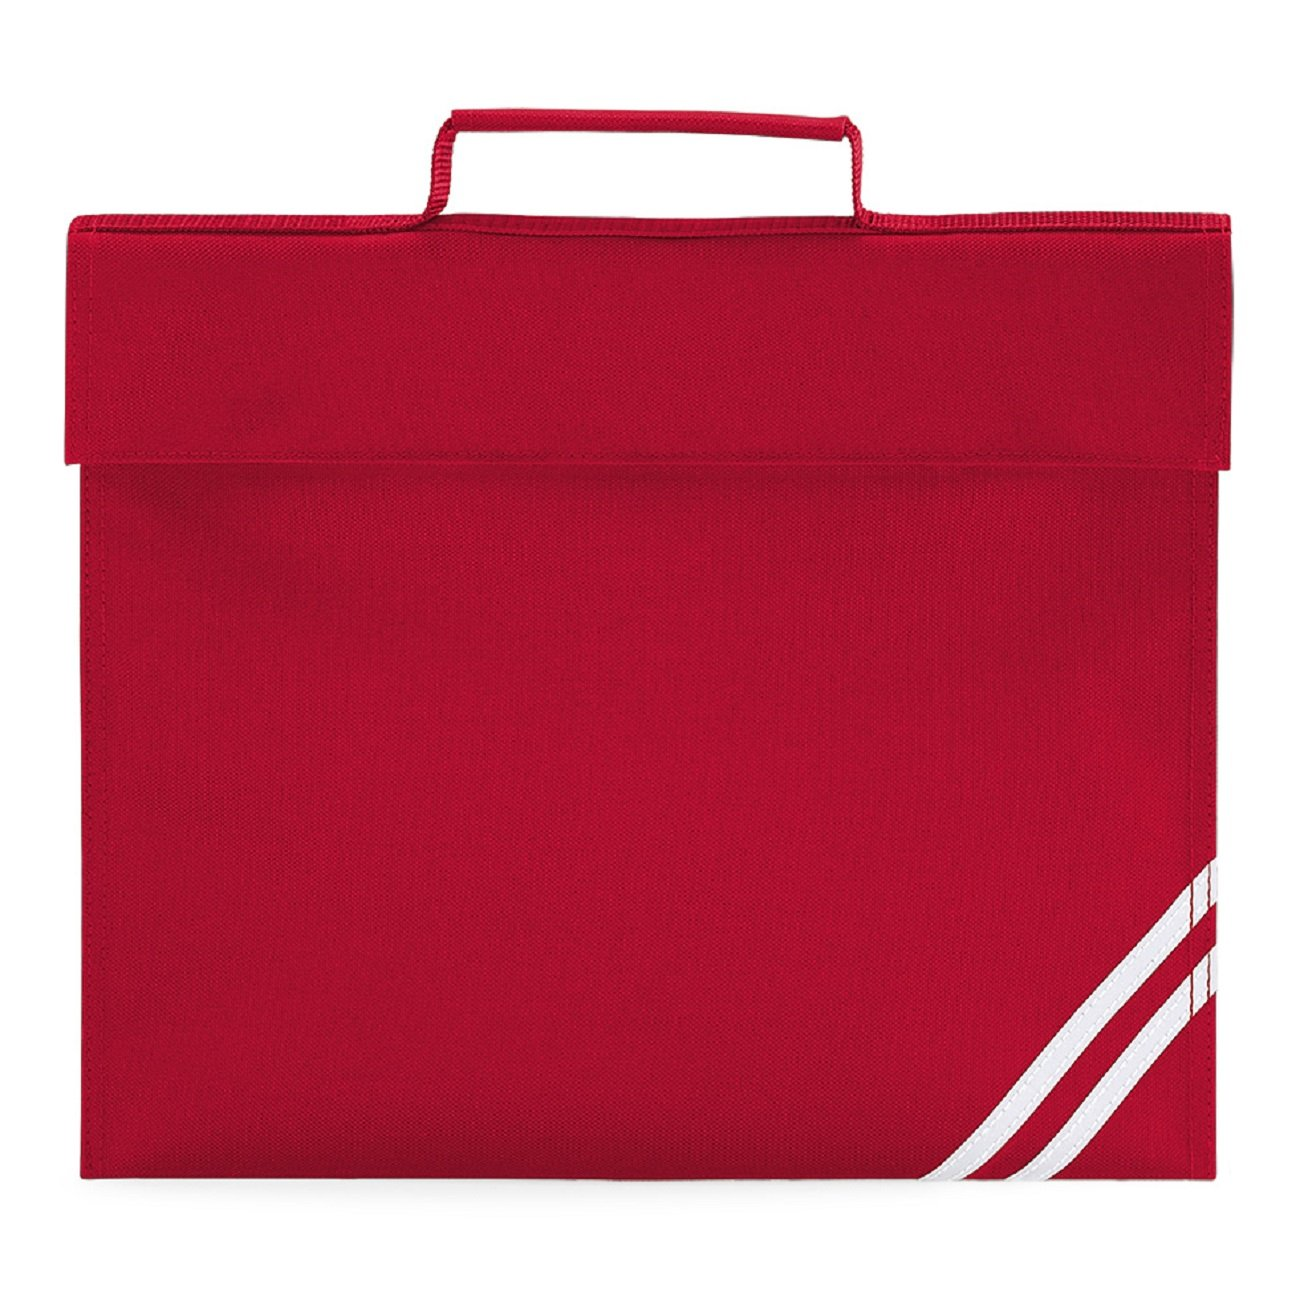 3e74dba11898 Quadra classic book bag in black(Size  One Size)  Amazon.co.uk  Luggage